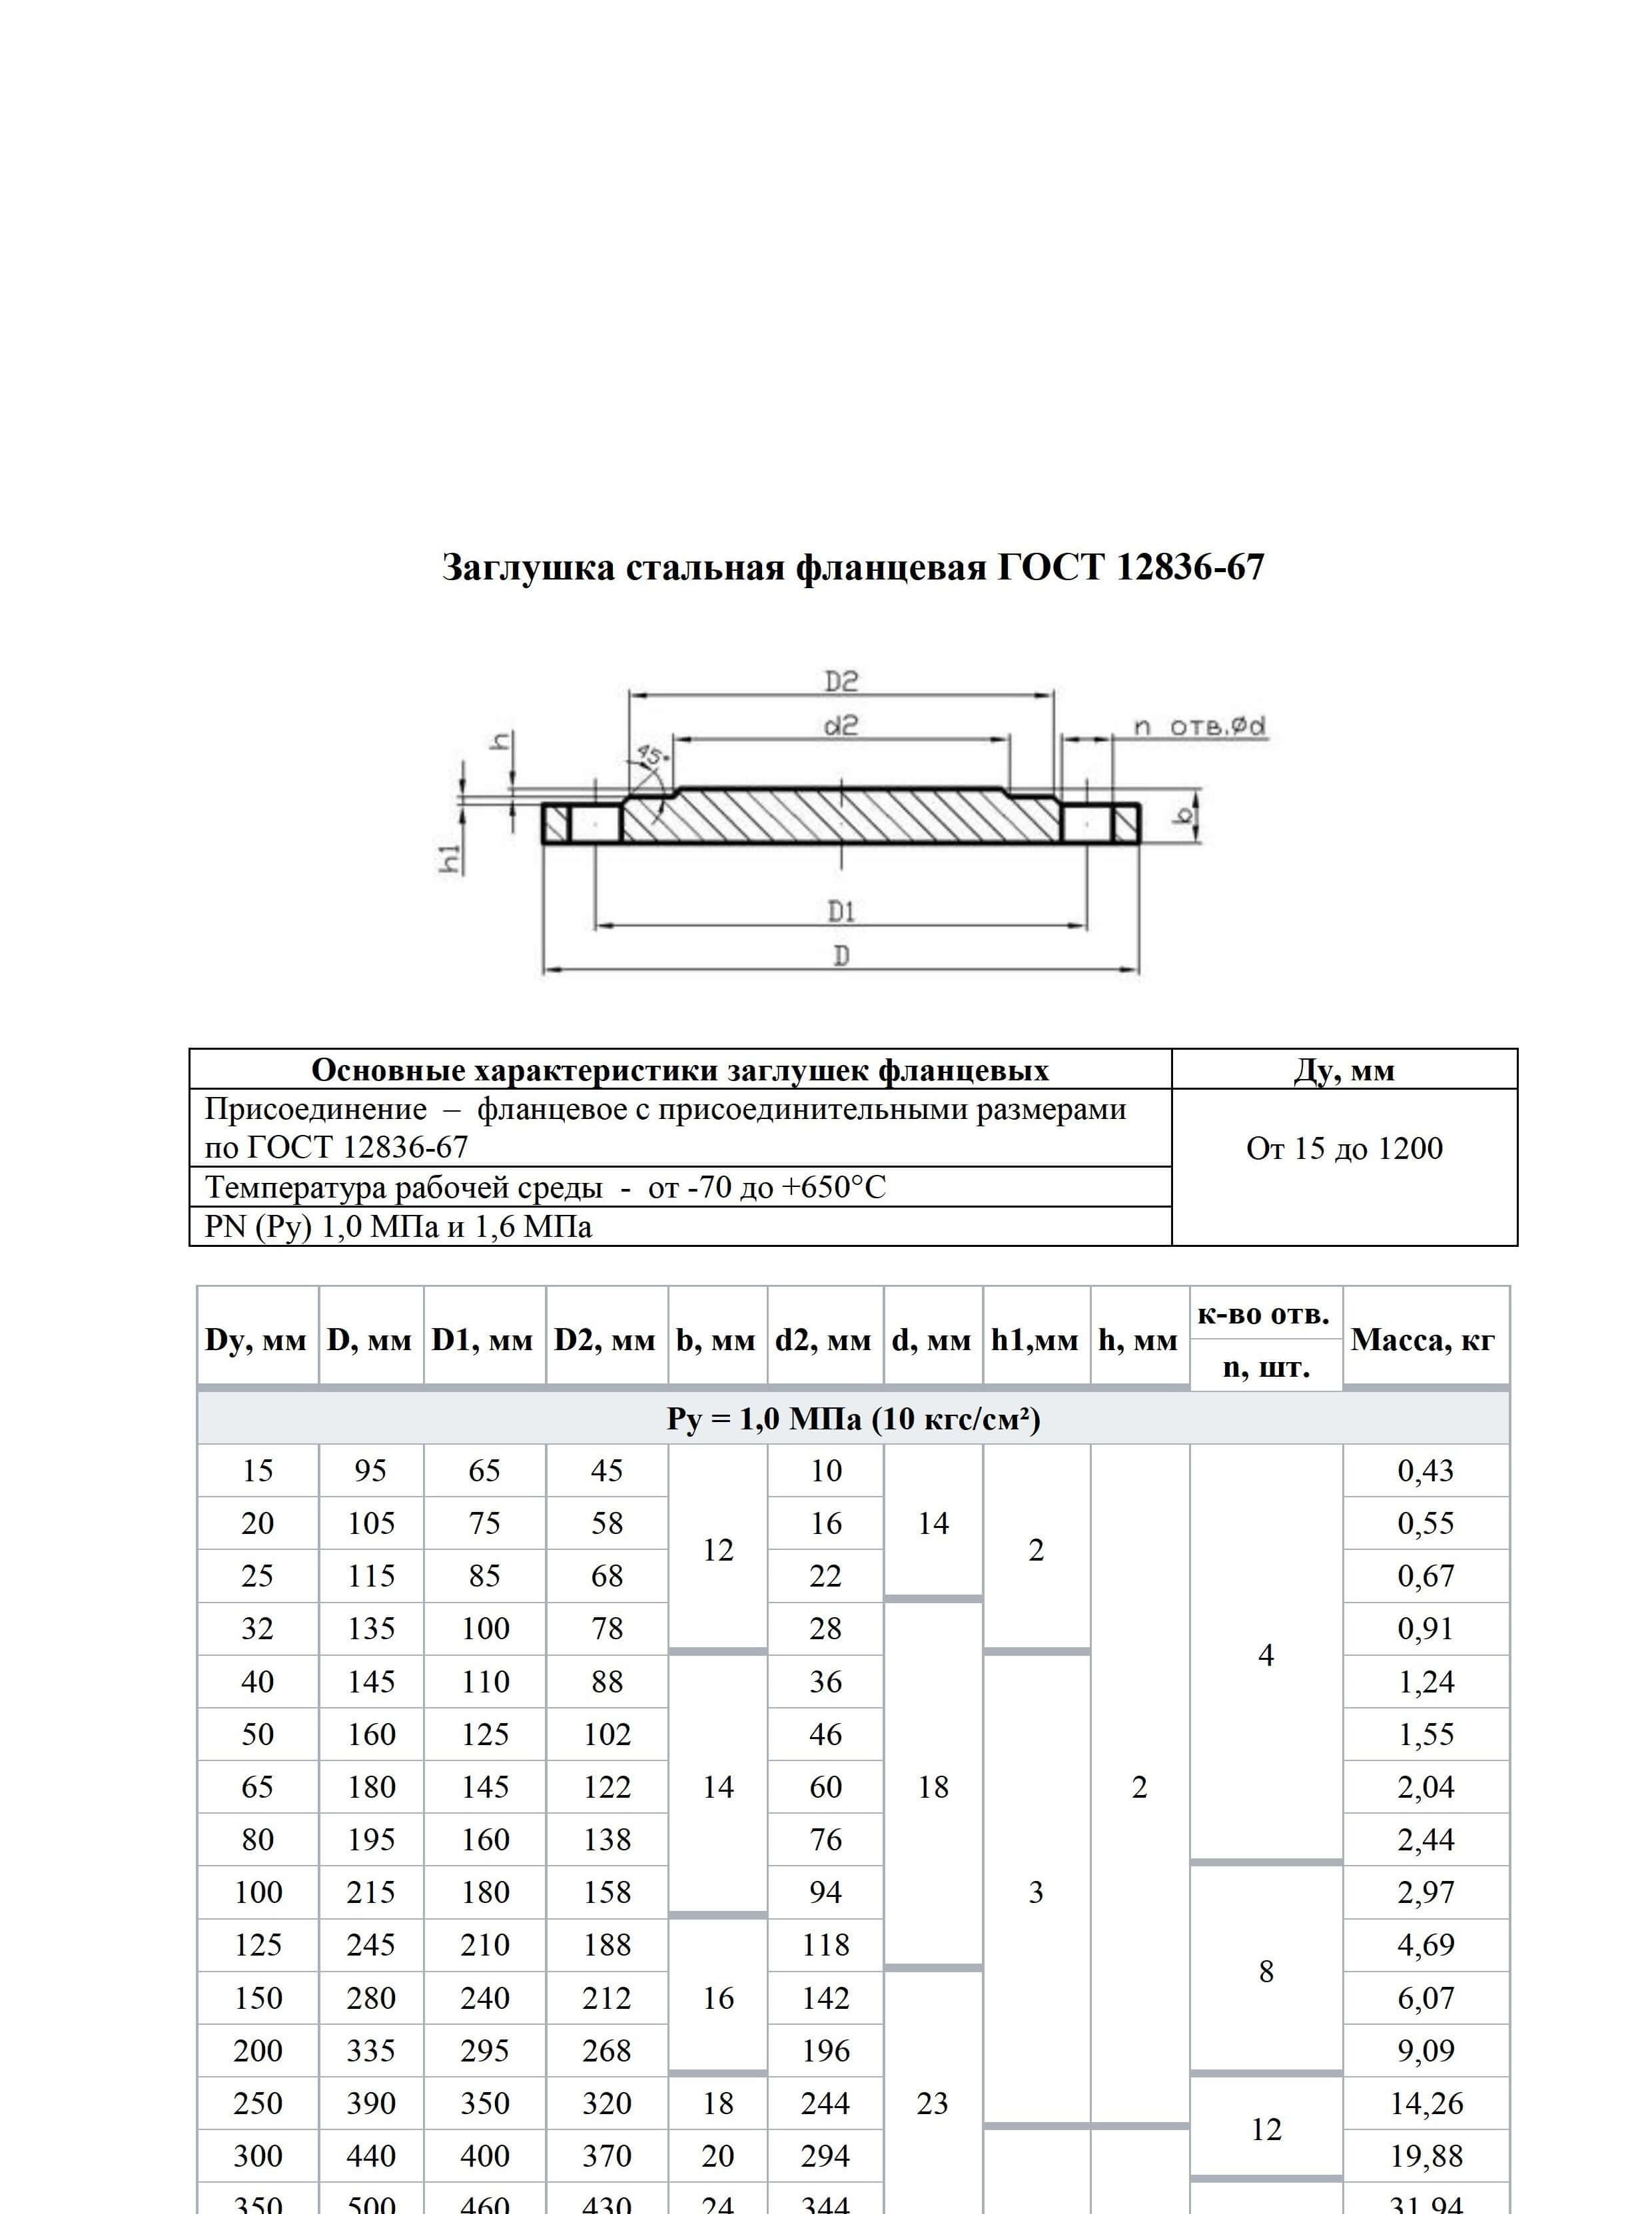 заглушки стальные фланцевые ГОСТ 128-67